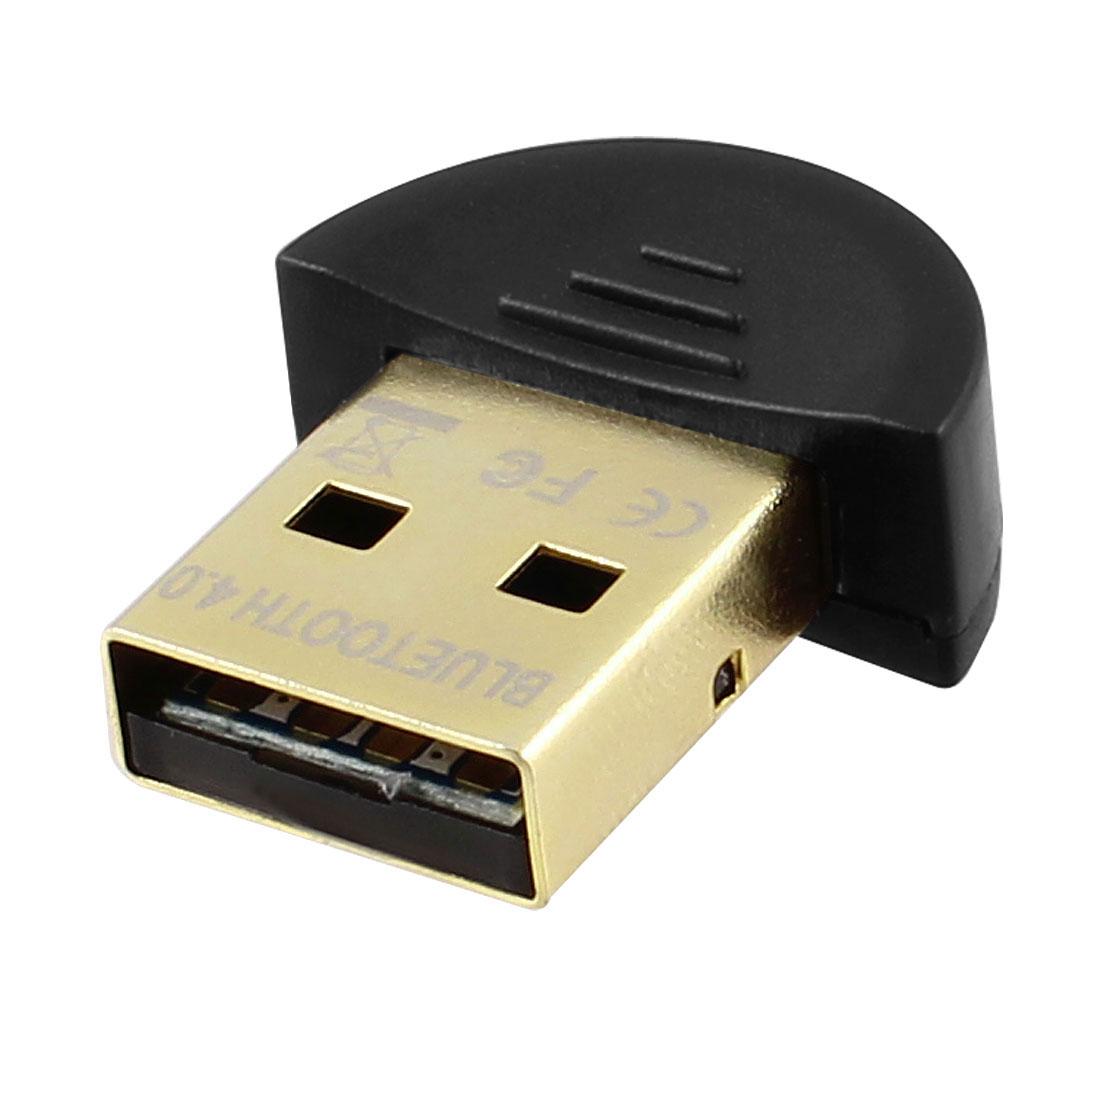 USB 4.0 bluetooth Dongle Adapter Micro Windows 7 Notebook Computer PC